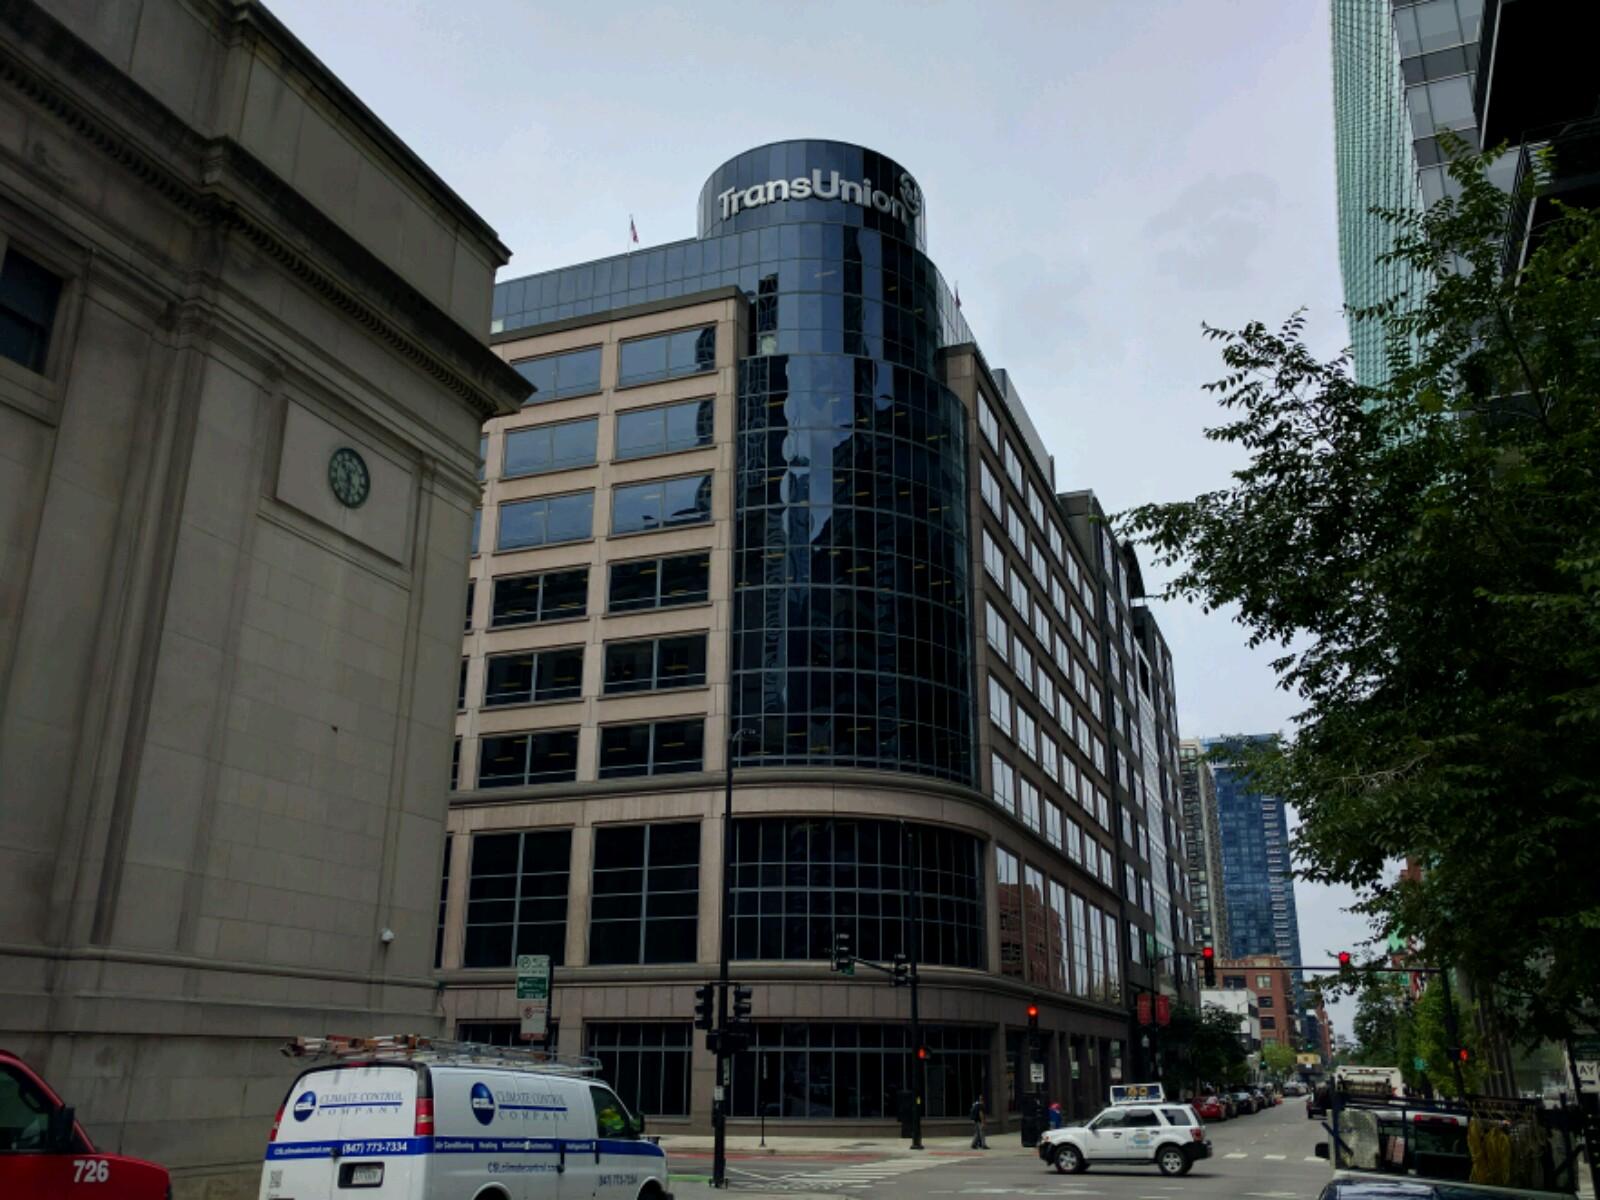 TransUnion's corporate headquarters in downtown Chicago, Illinois.